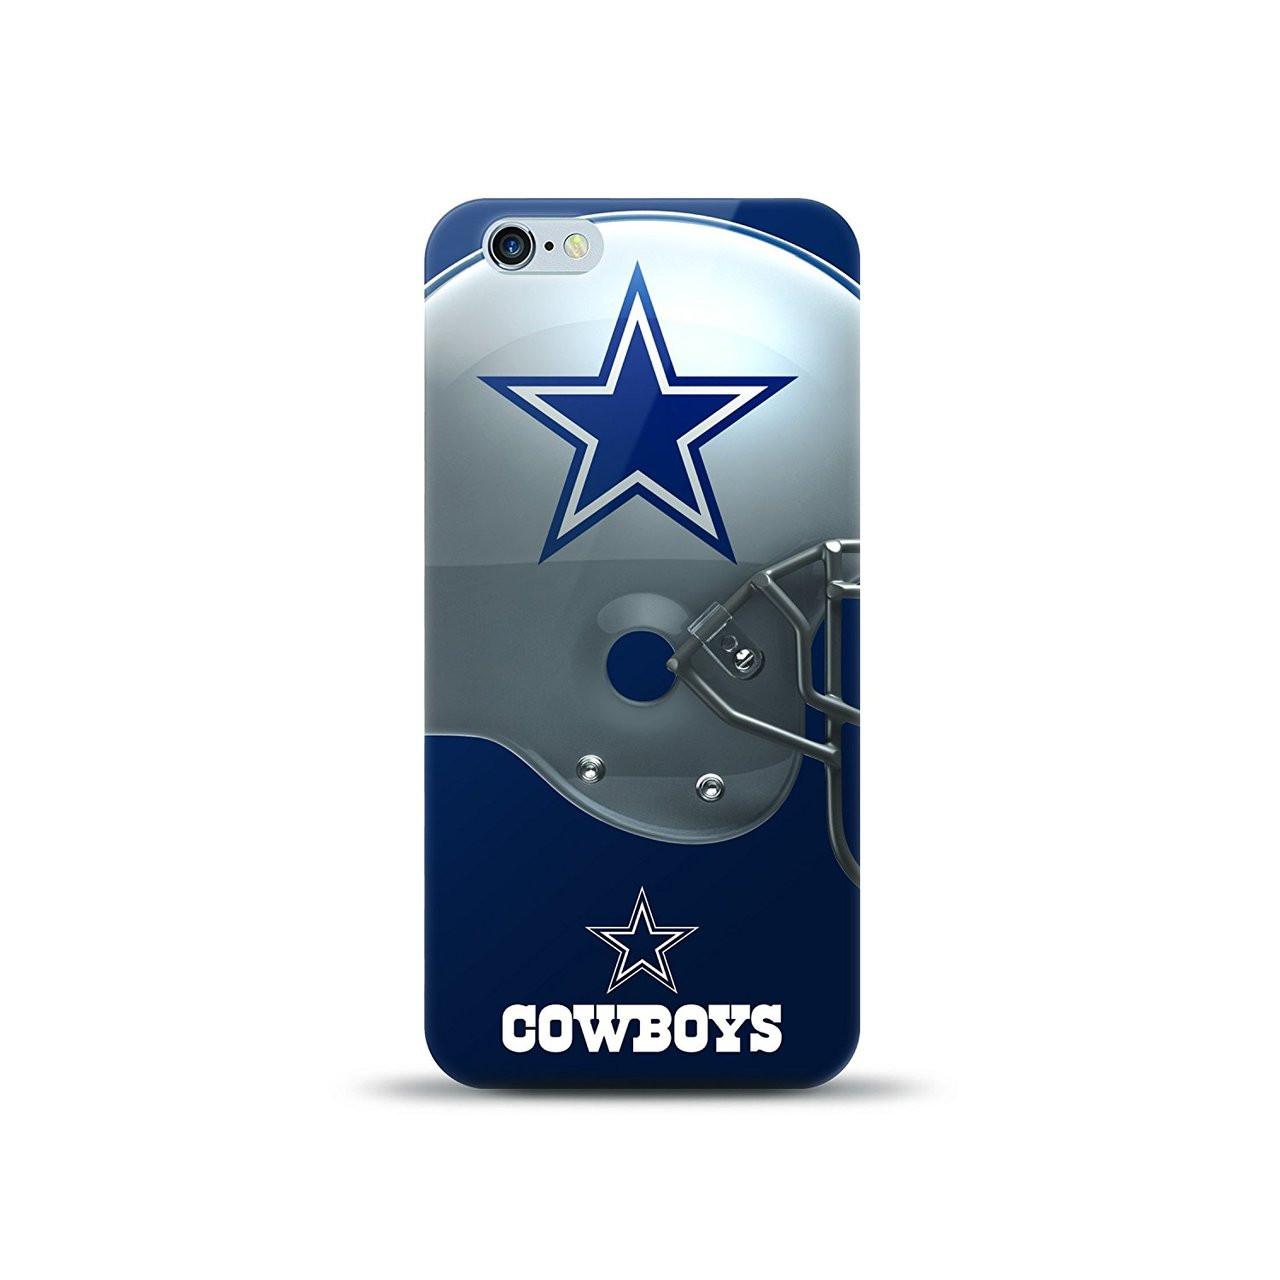 quality design 77e6e b95f5 NFL Dallas Cowboys iPhone 7+ Plus Helmet Series TPU Gel Case